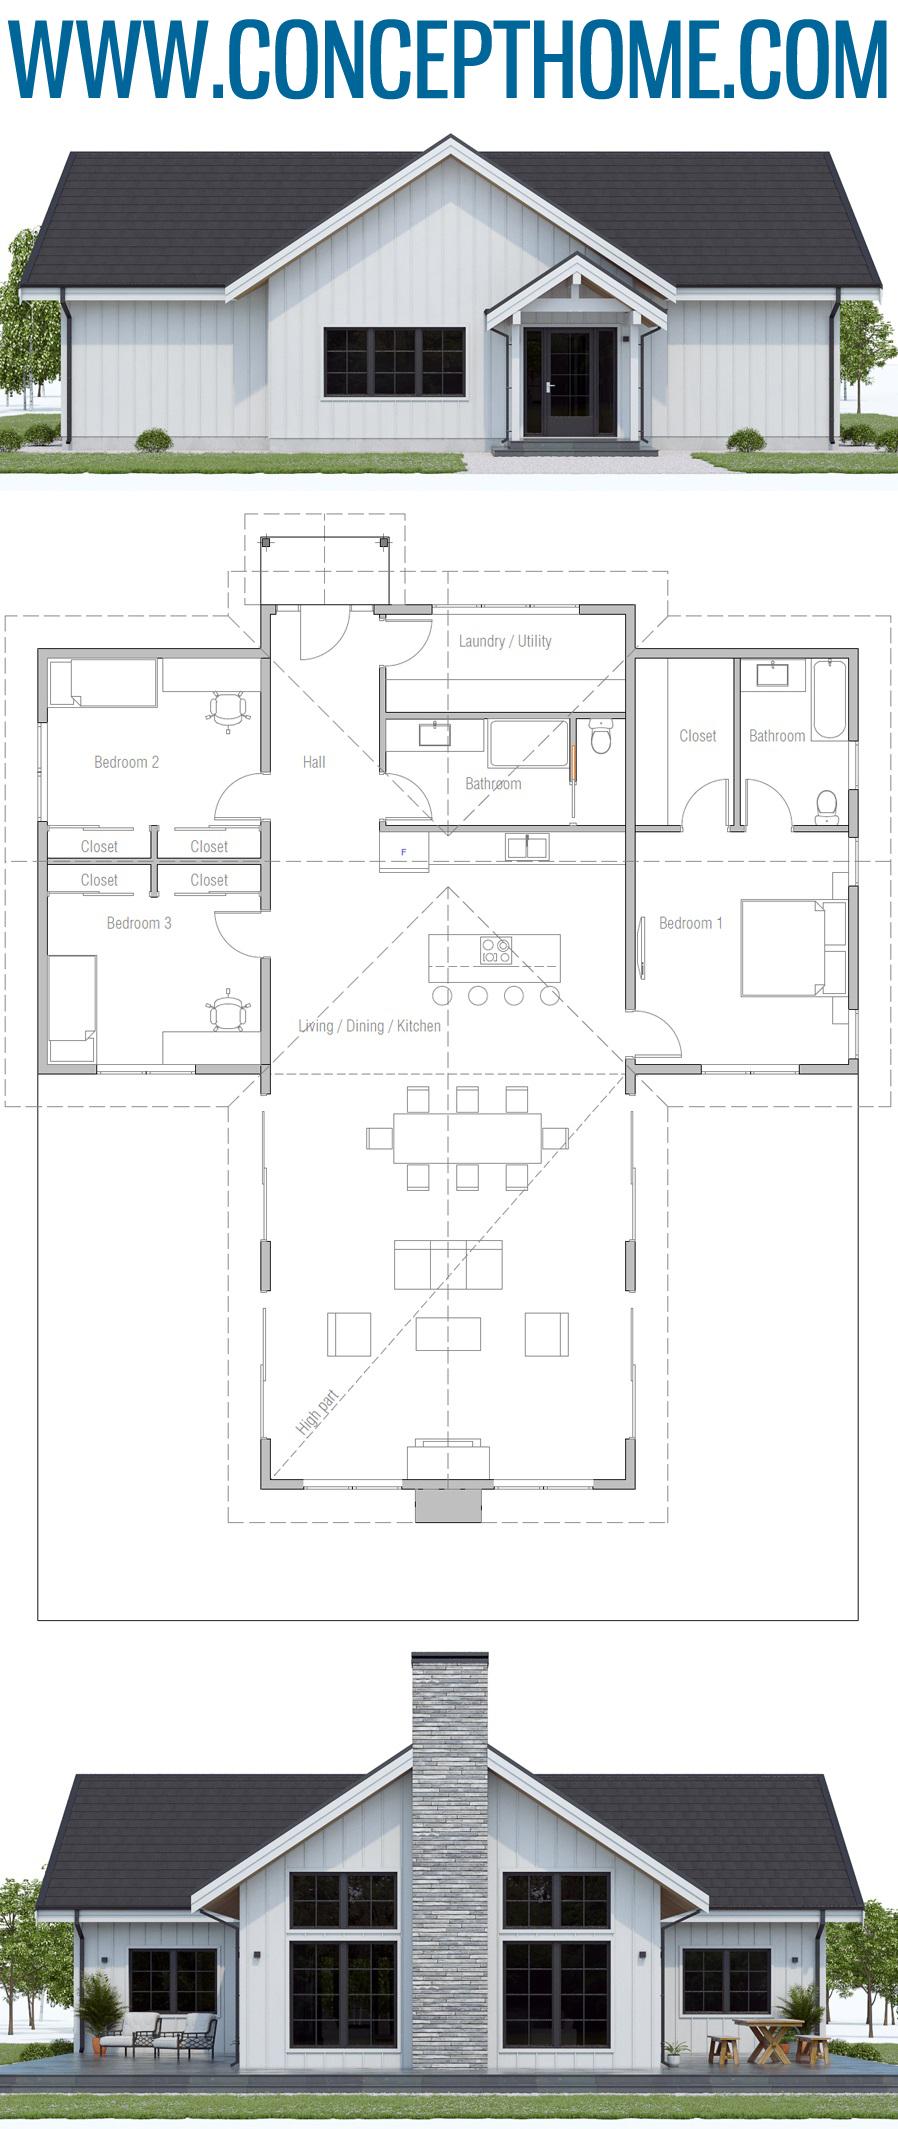 Single Story Home Plan Ch594 House Plans House Plans Farmhouse House Design